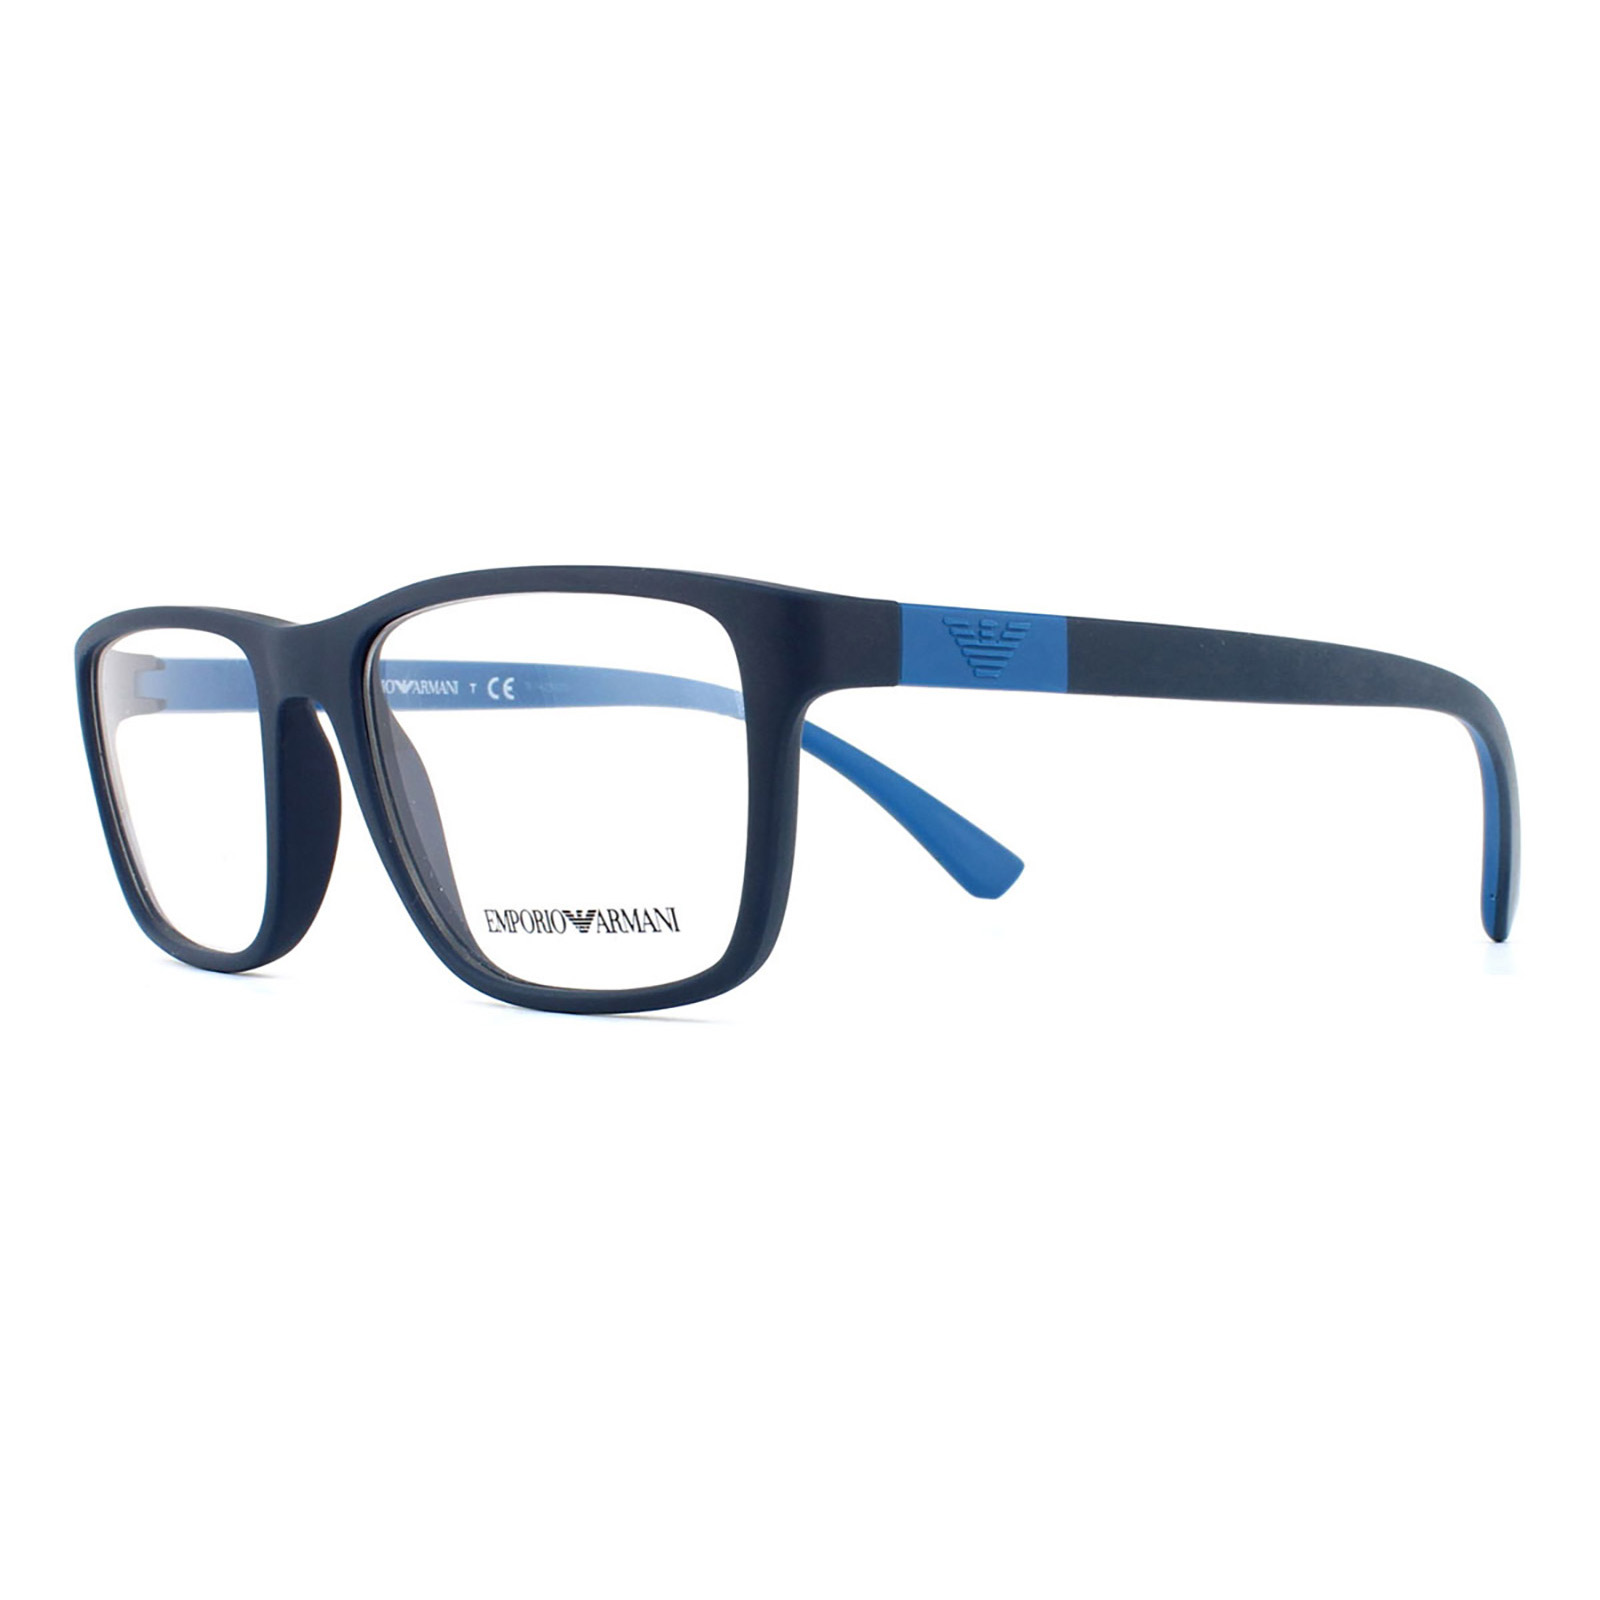 5f543549ef7 Emporio Armani Glasses Frames